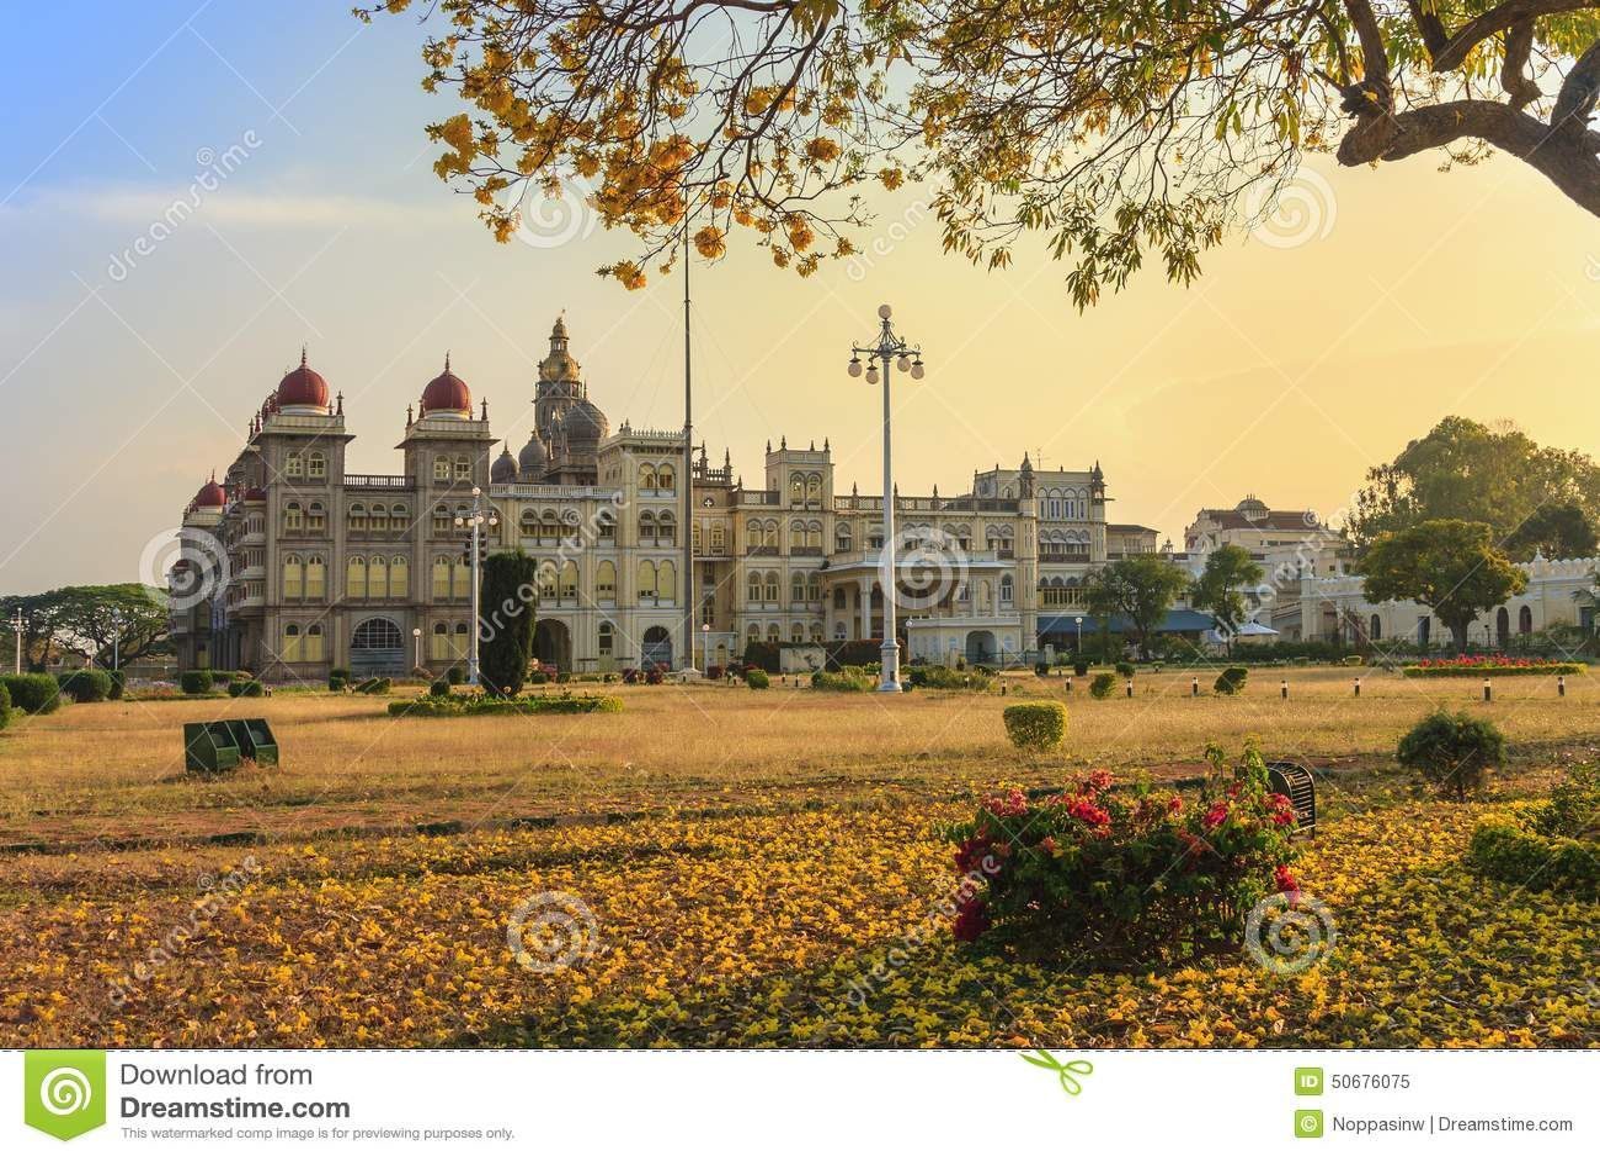 Download 迈索尔宫殿,印度 库存图片. 图片 包括有 迈索尔, 城堡, 拱道, 印度, 吸引力, 庭院, 宫殿, 地标 - 50676075